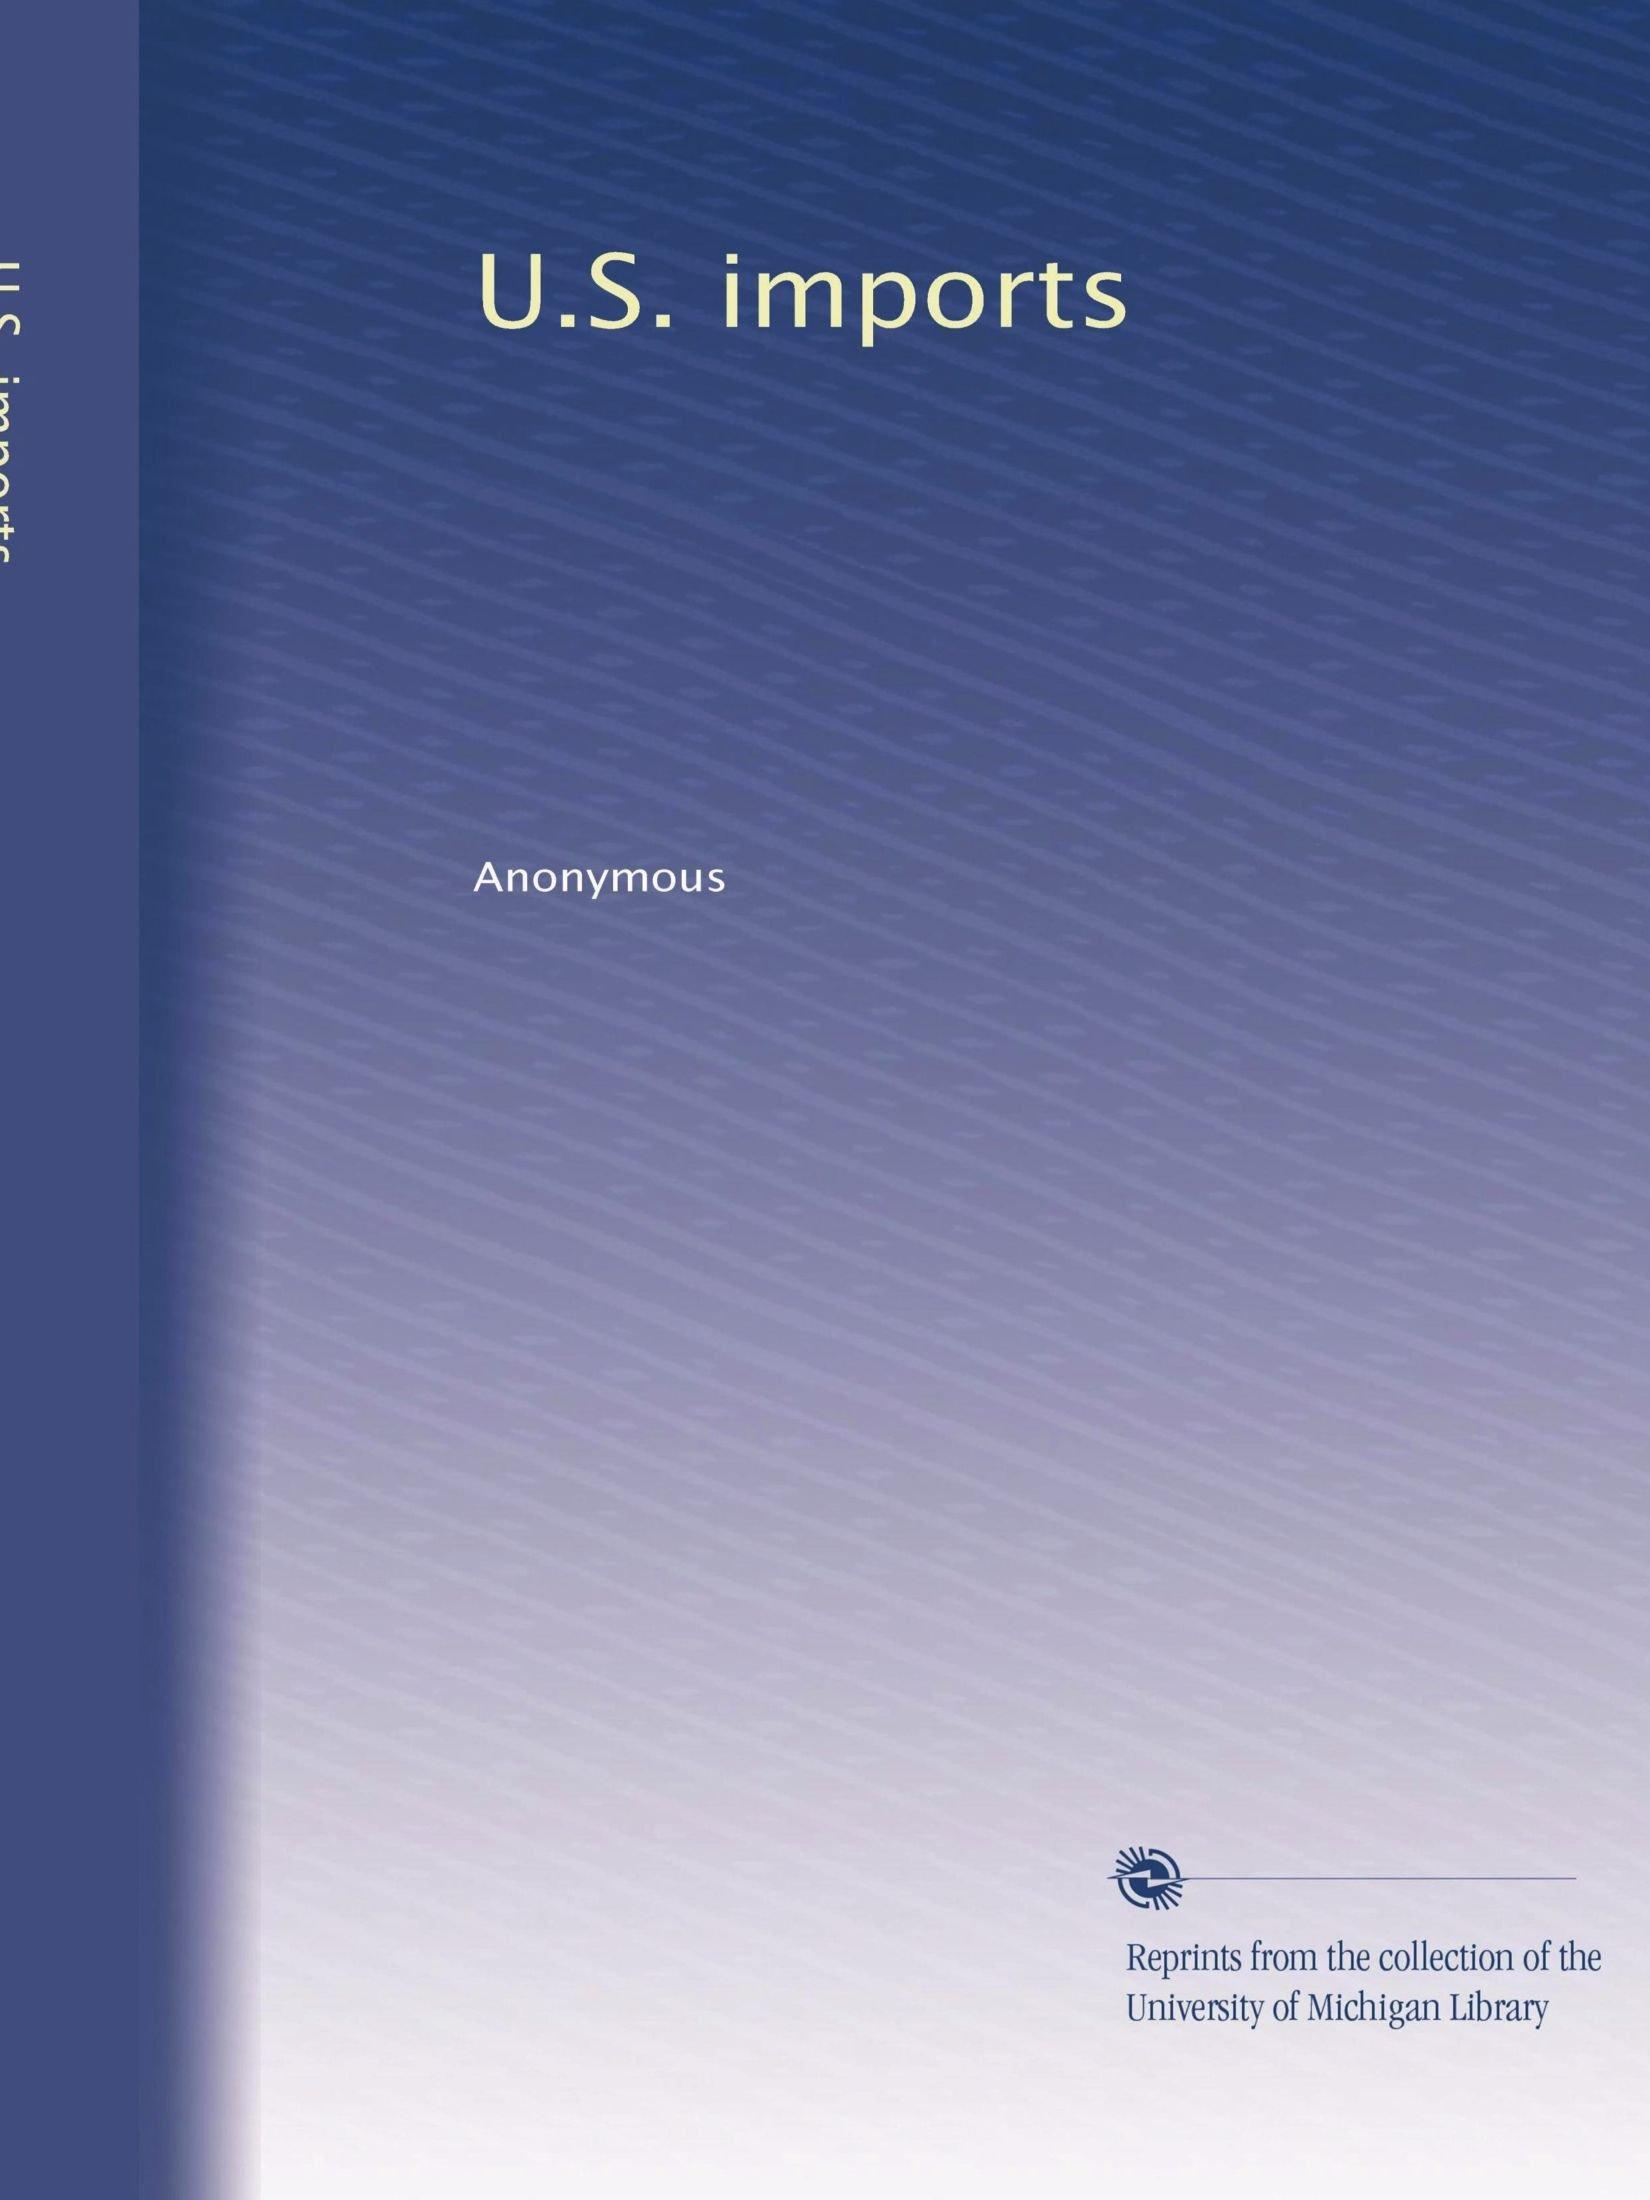 U.S. imports (Volume 2) pdf